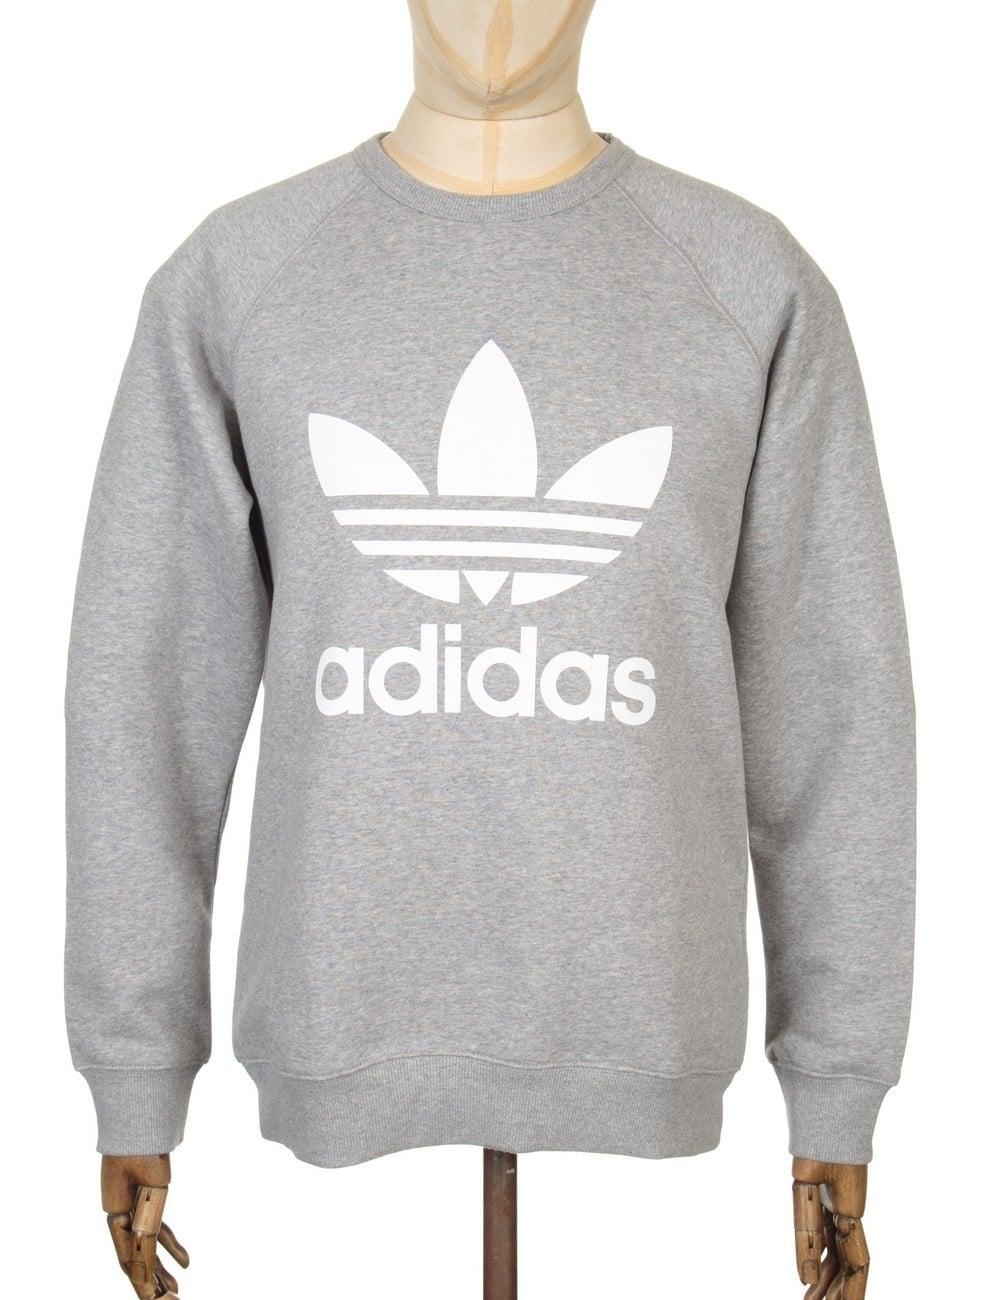 b676710c7904 Adidas Originals Trefoil Sweatshirt - Heather Grey - Clothing from ...